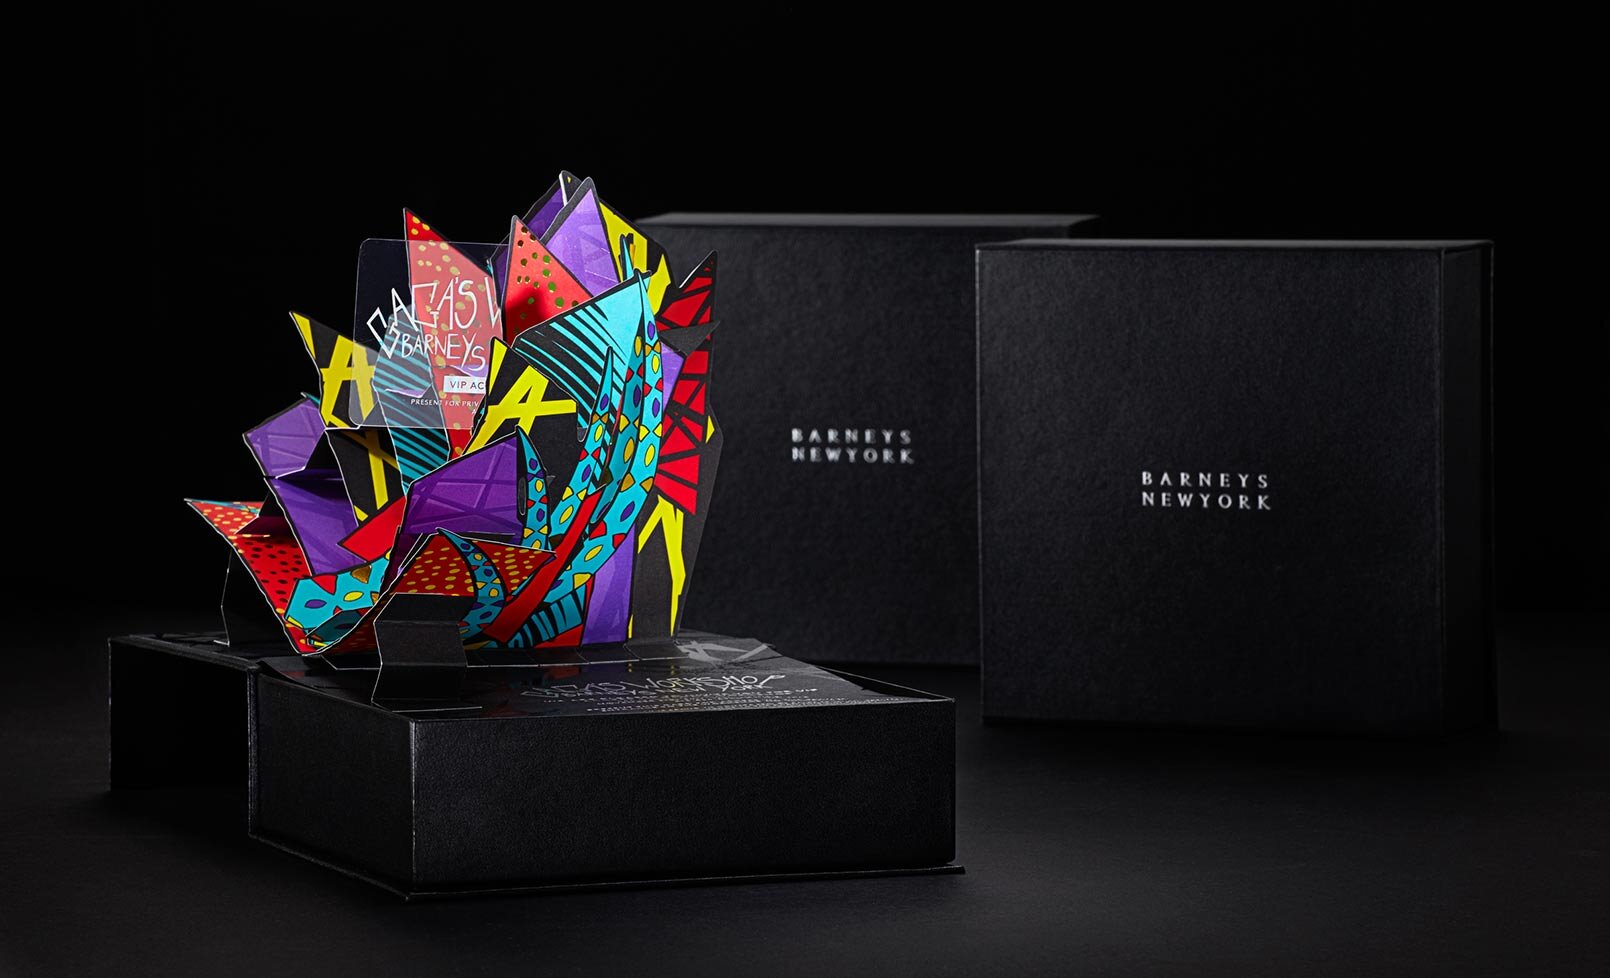 Barneys-New-York-Holiday-Lady-Gaga-Worskshop-Design-Packaging-Company-1.JPG